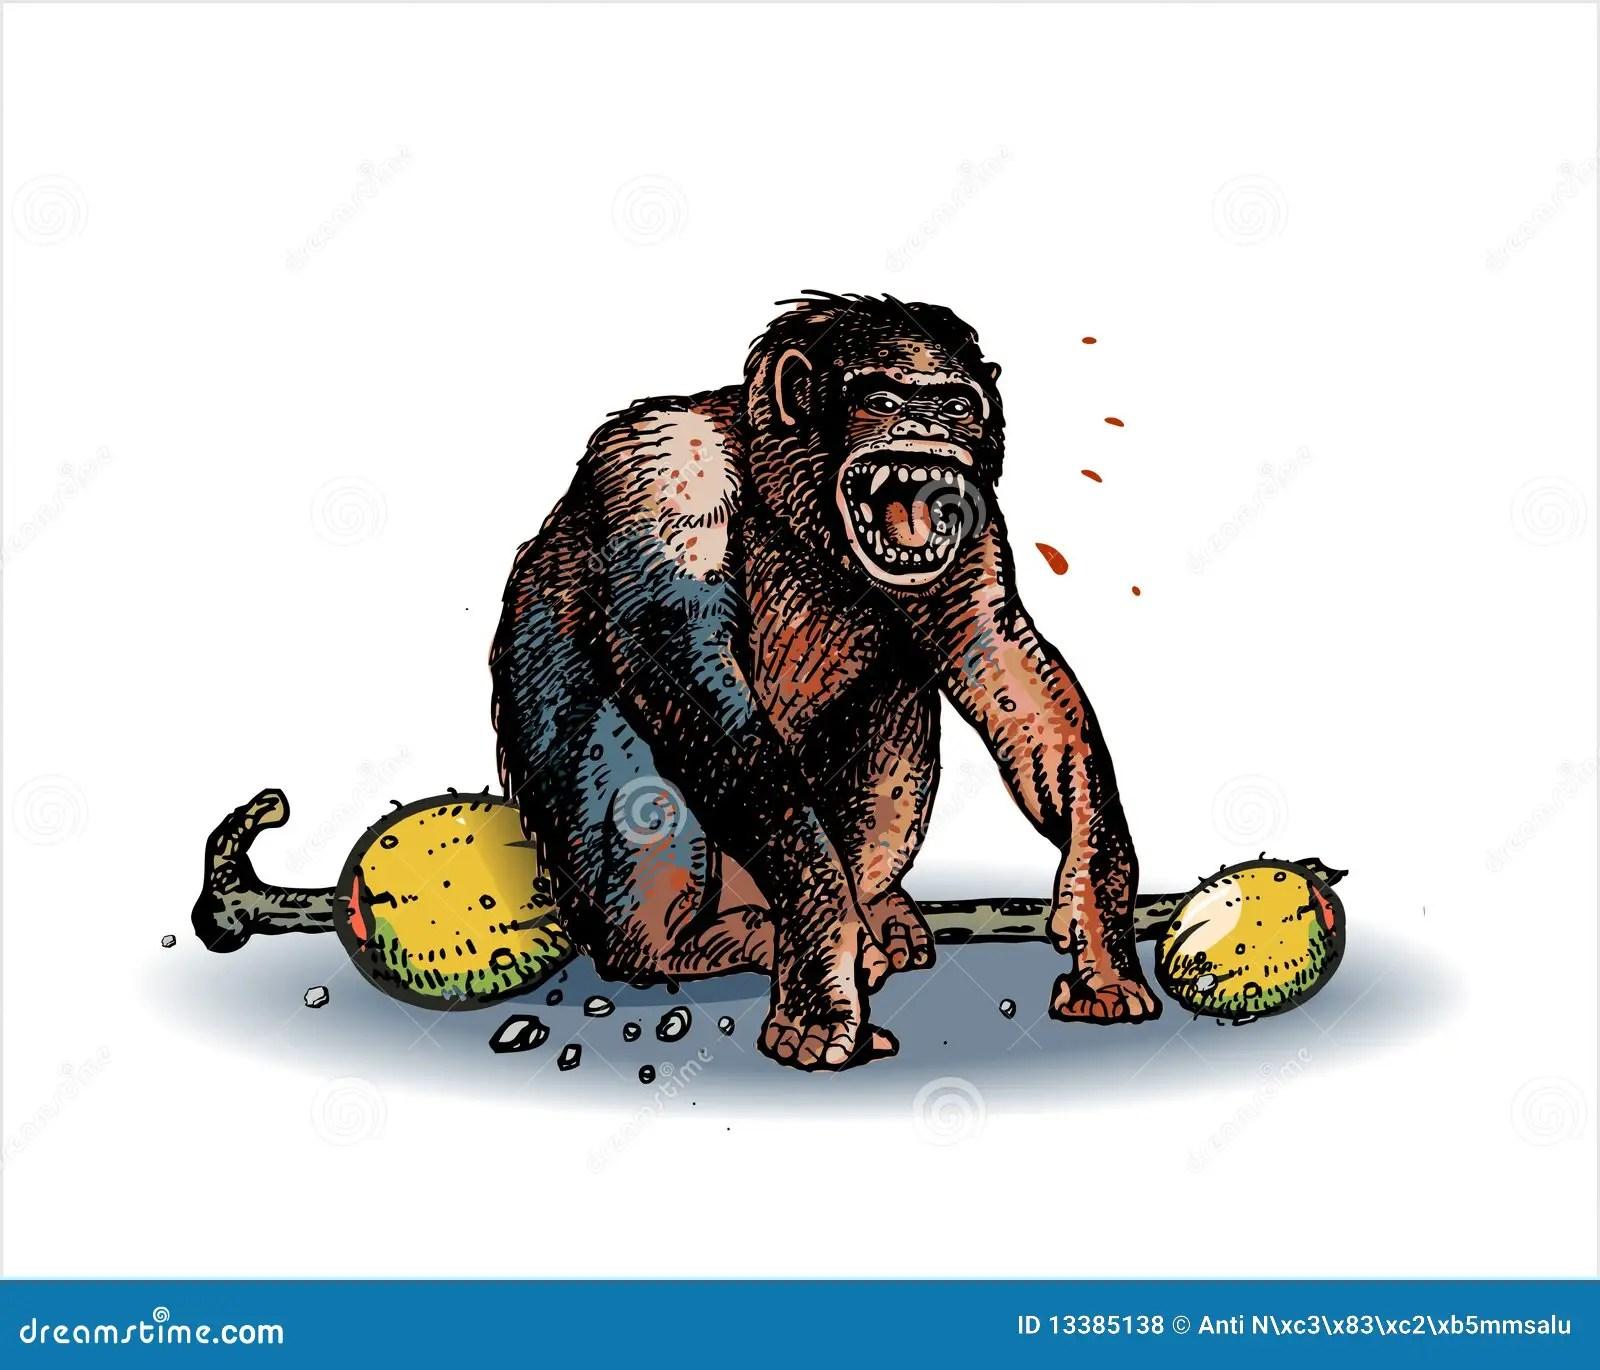 Wallpaper Cute Light Pink Monkey Screaming Royalty Free Stock Photos Image 13385138